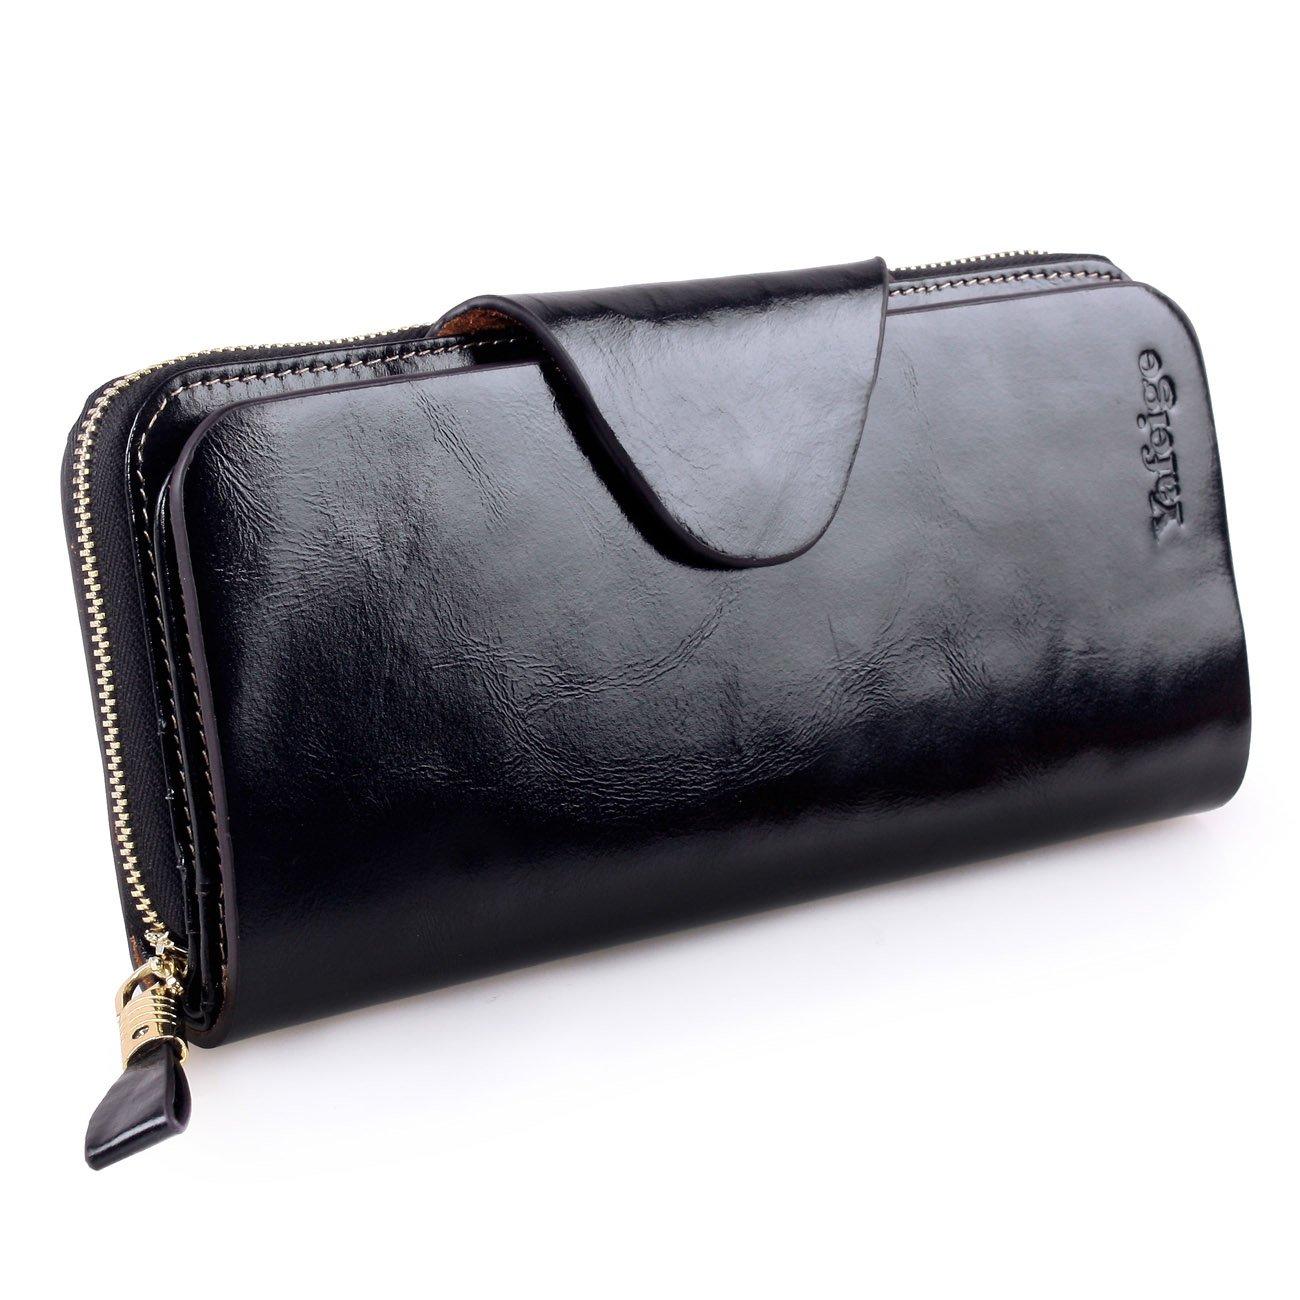 Yafeige Large Luxury Women s RFID Blocking Tri-fold Leather Wallet Zipper  Ladies Clutch Purse(1-Waxed Black) at Amazon Women s Clothing store  630d5f8dda23e